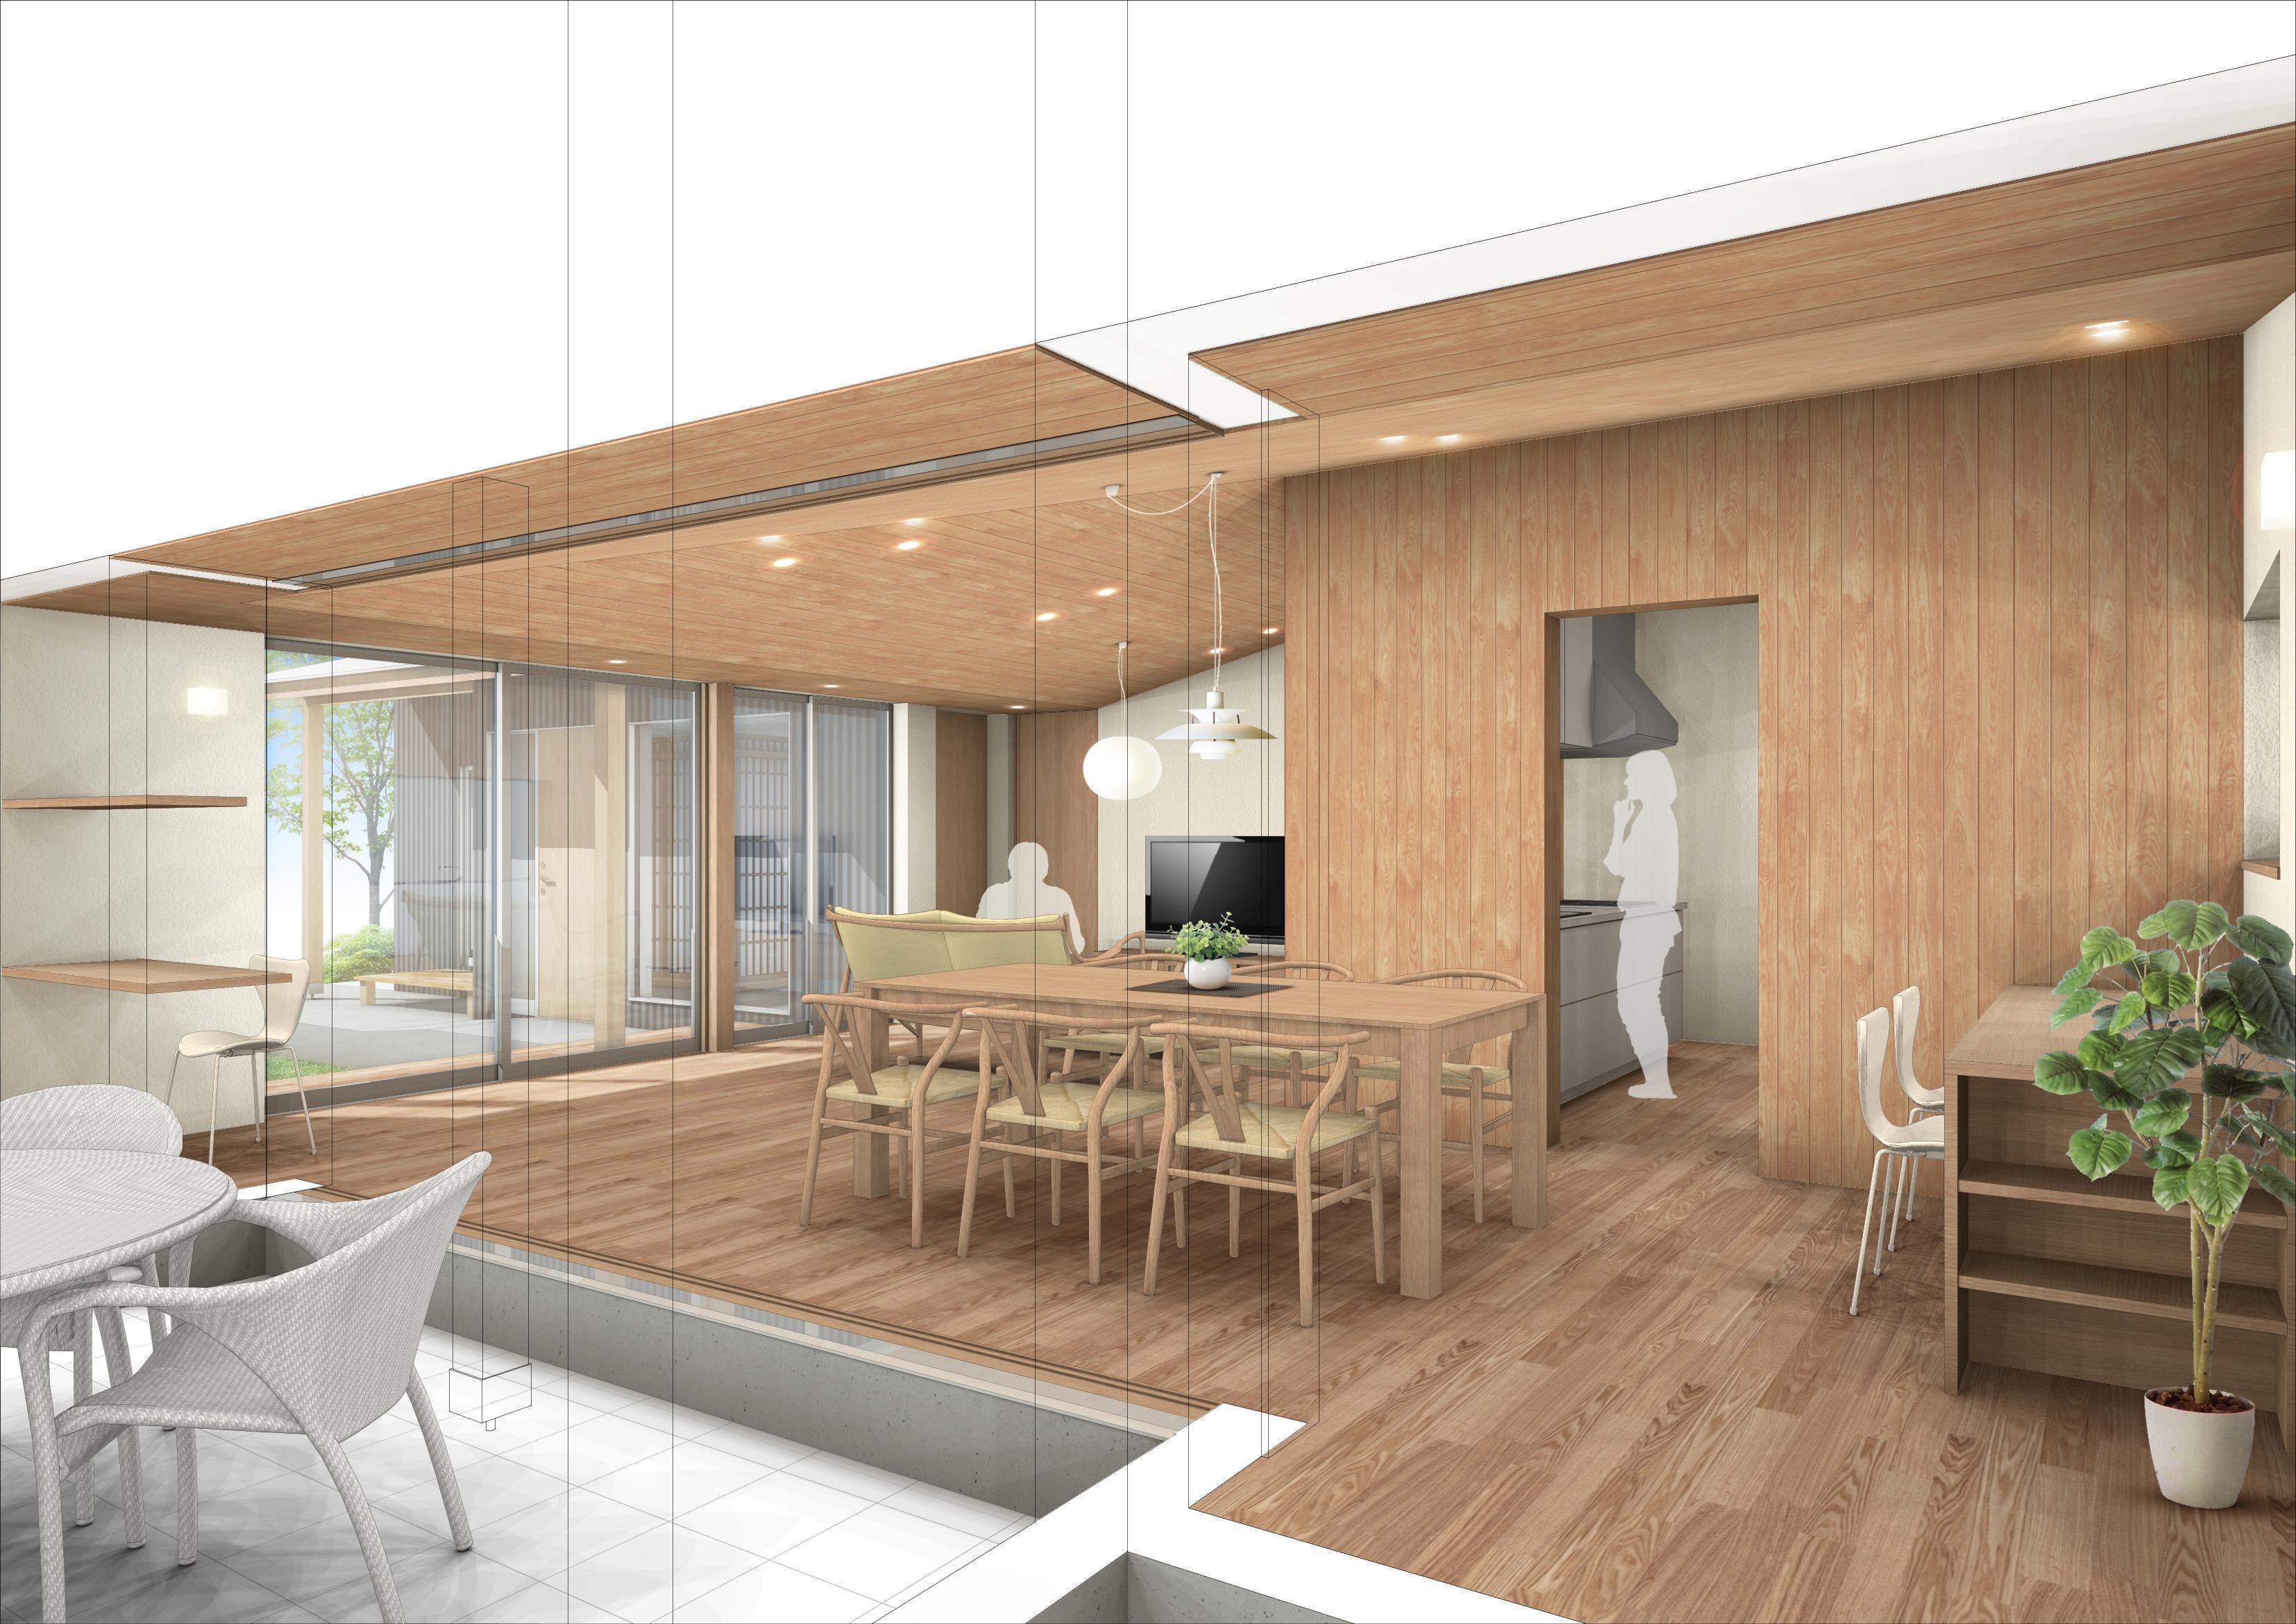 愛知県犬山市「古券の家」木造住宅 見積り